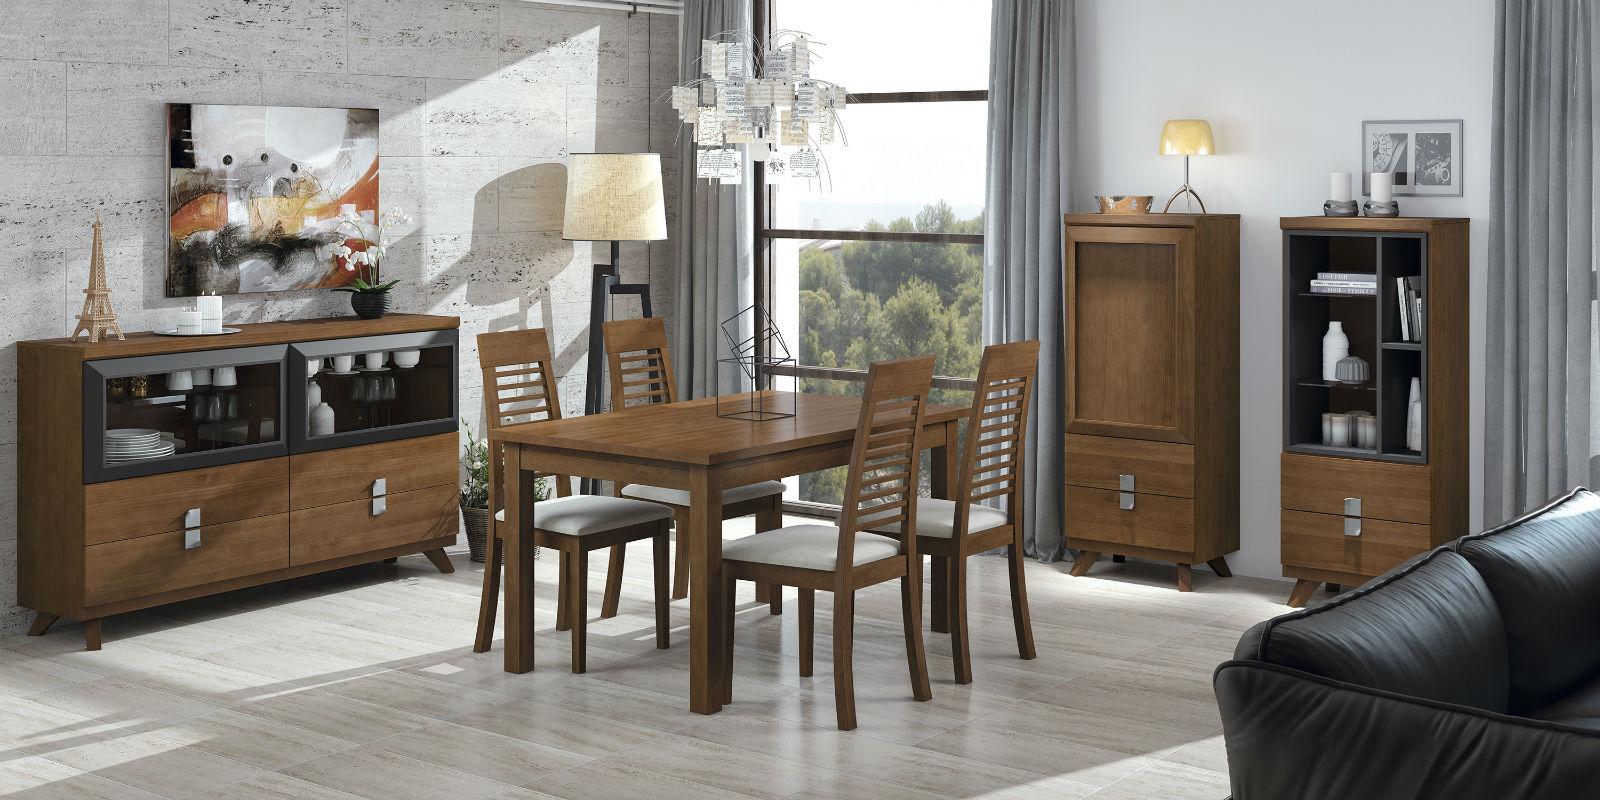 Muebles almer a muebles abrucena muebles baratos for Ver comedores modernos